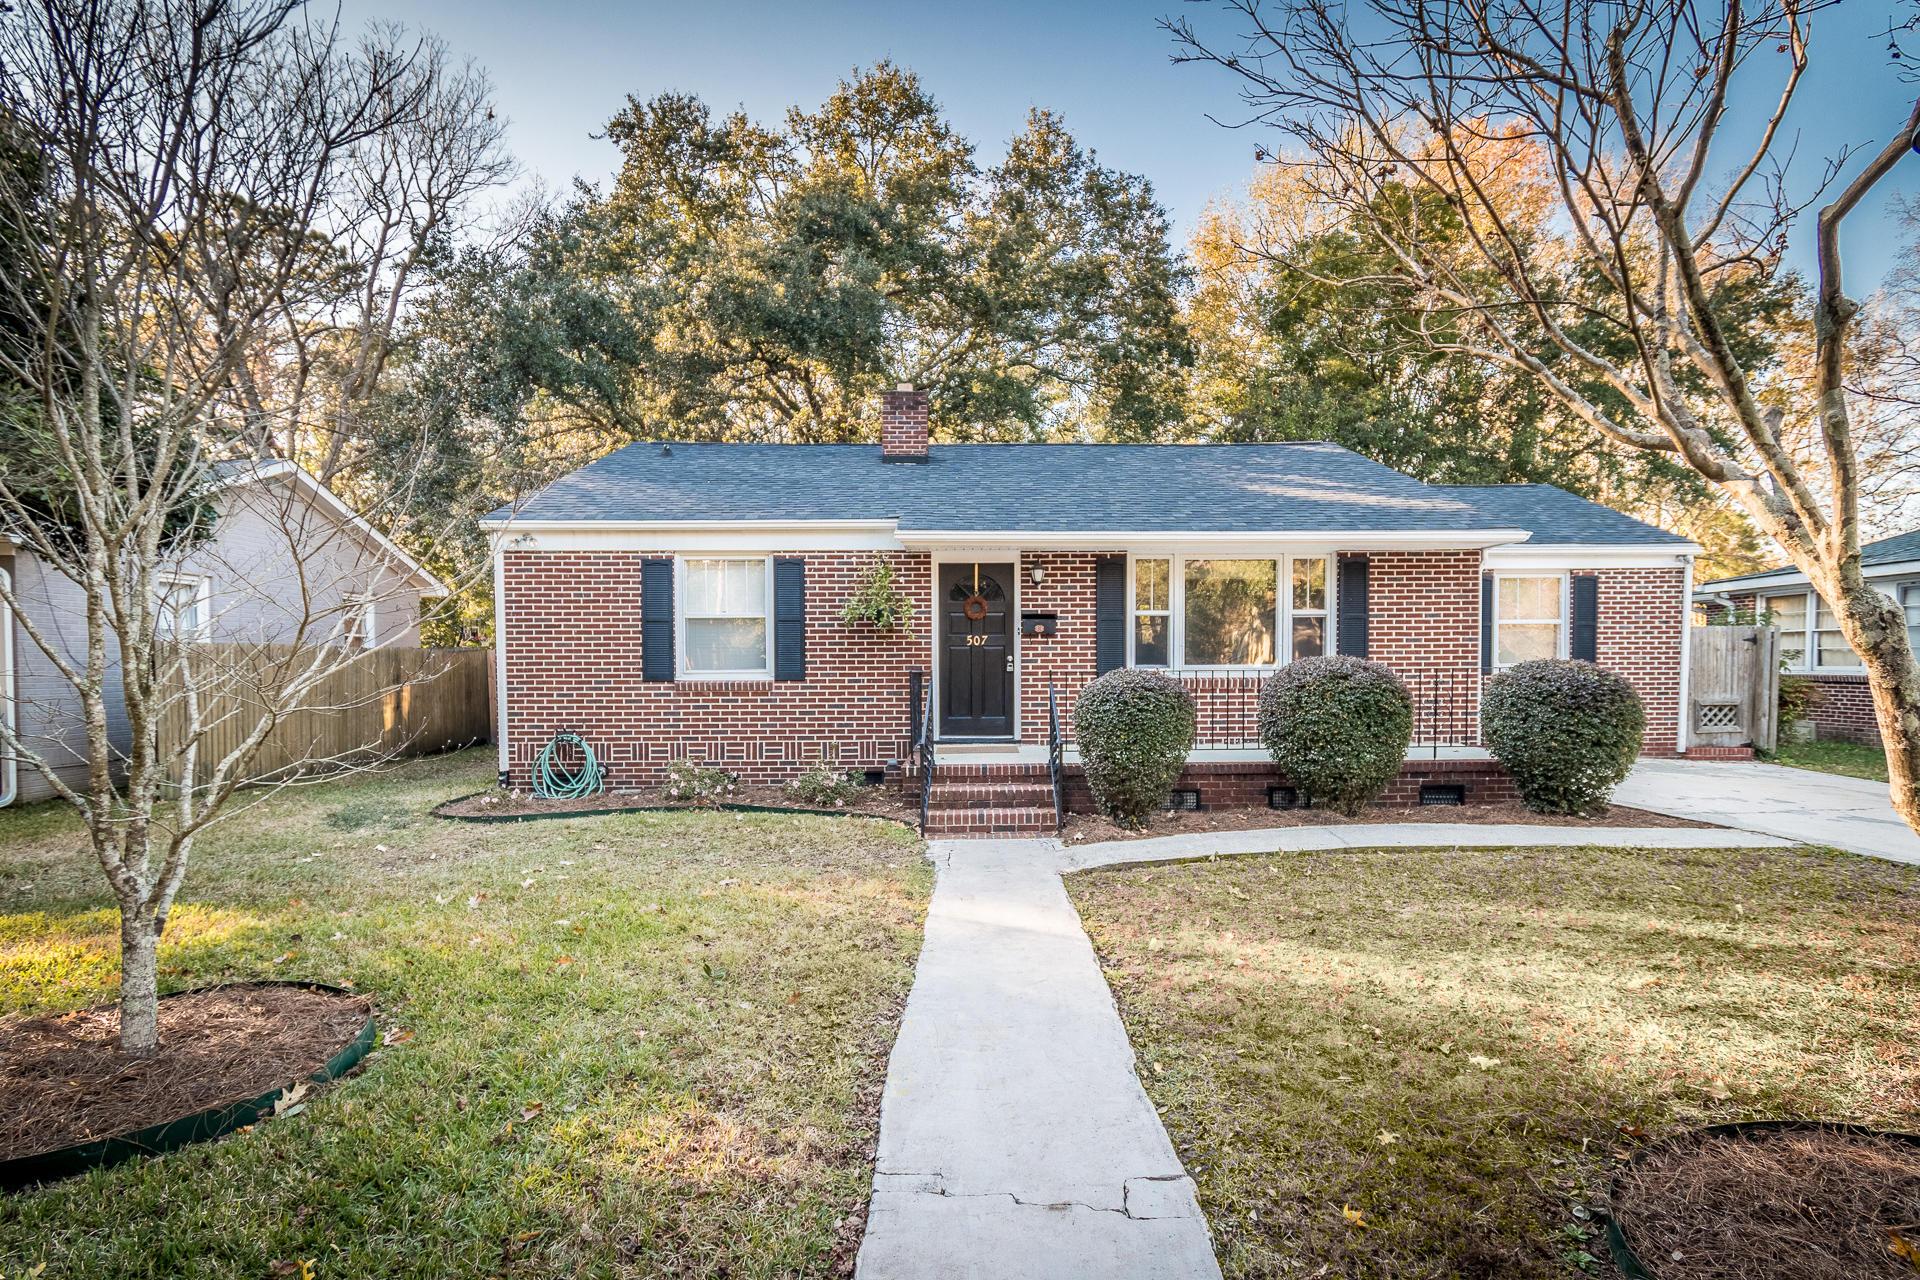 Edgewood Gardens Homes For Sale - 507 Risher, Charleston, SC - 20